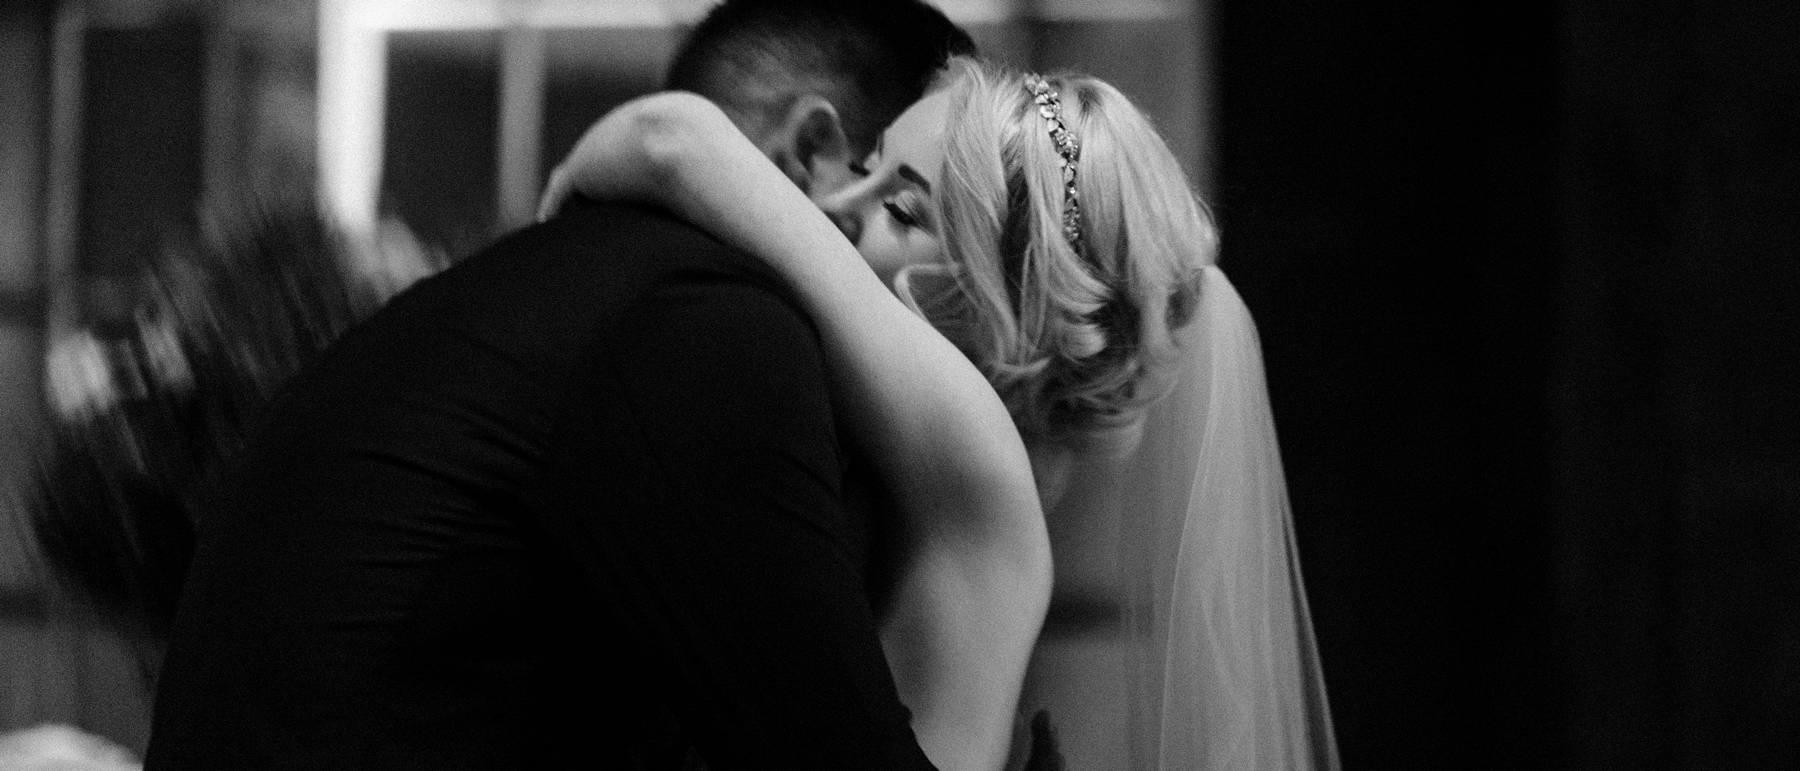 johnandjoseph-wedding-photographer-hz-slider-350